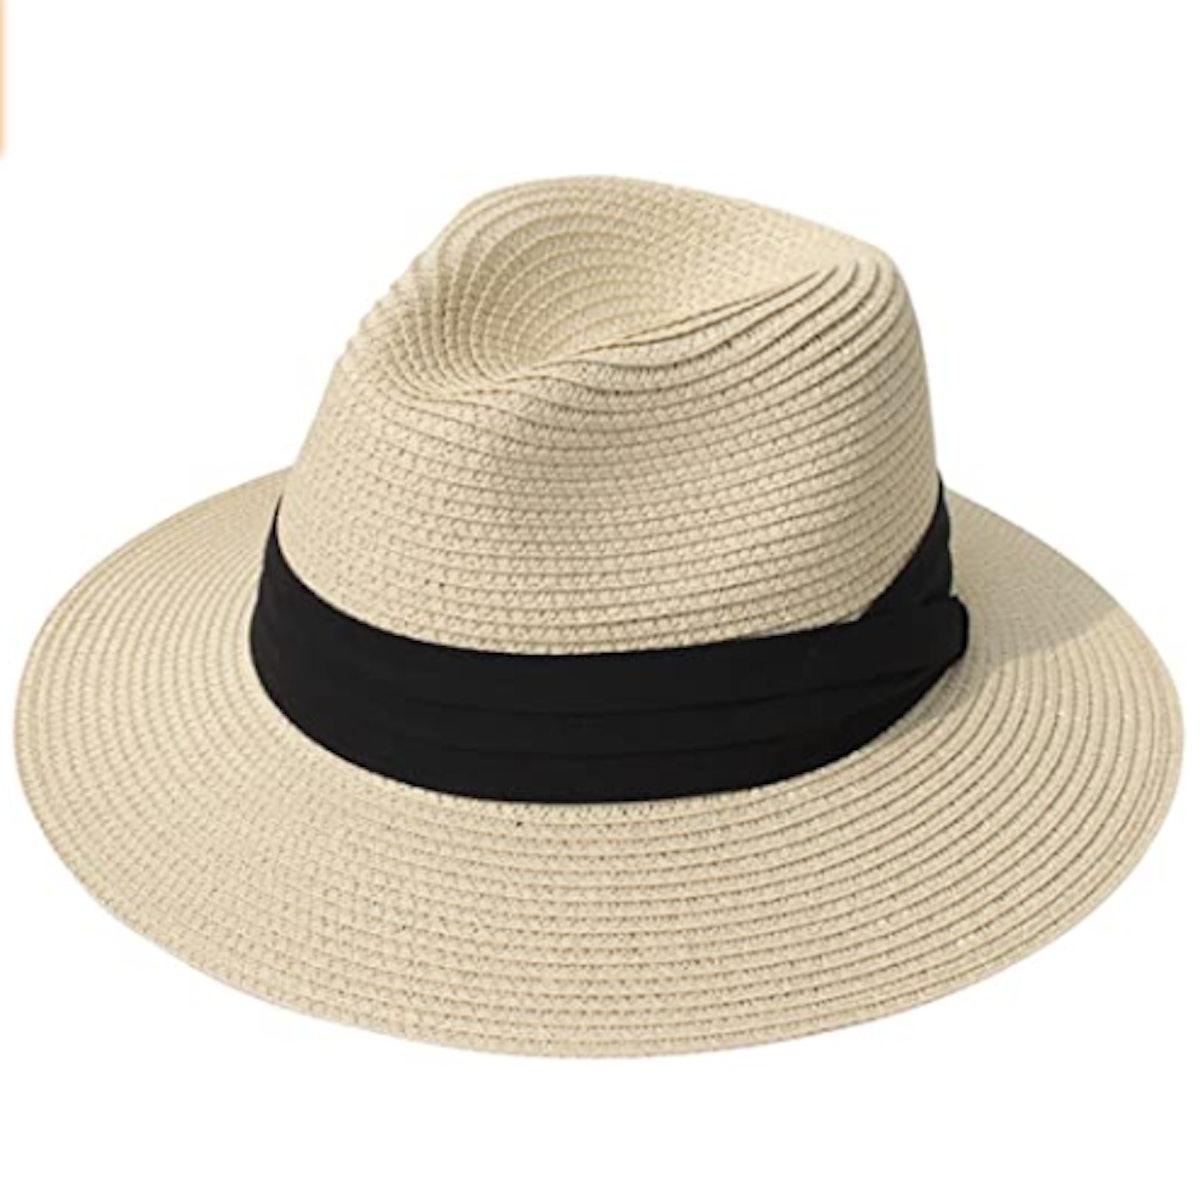 Lanzom Brim Straw Hat